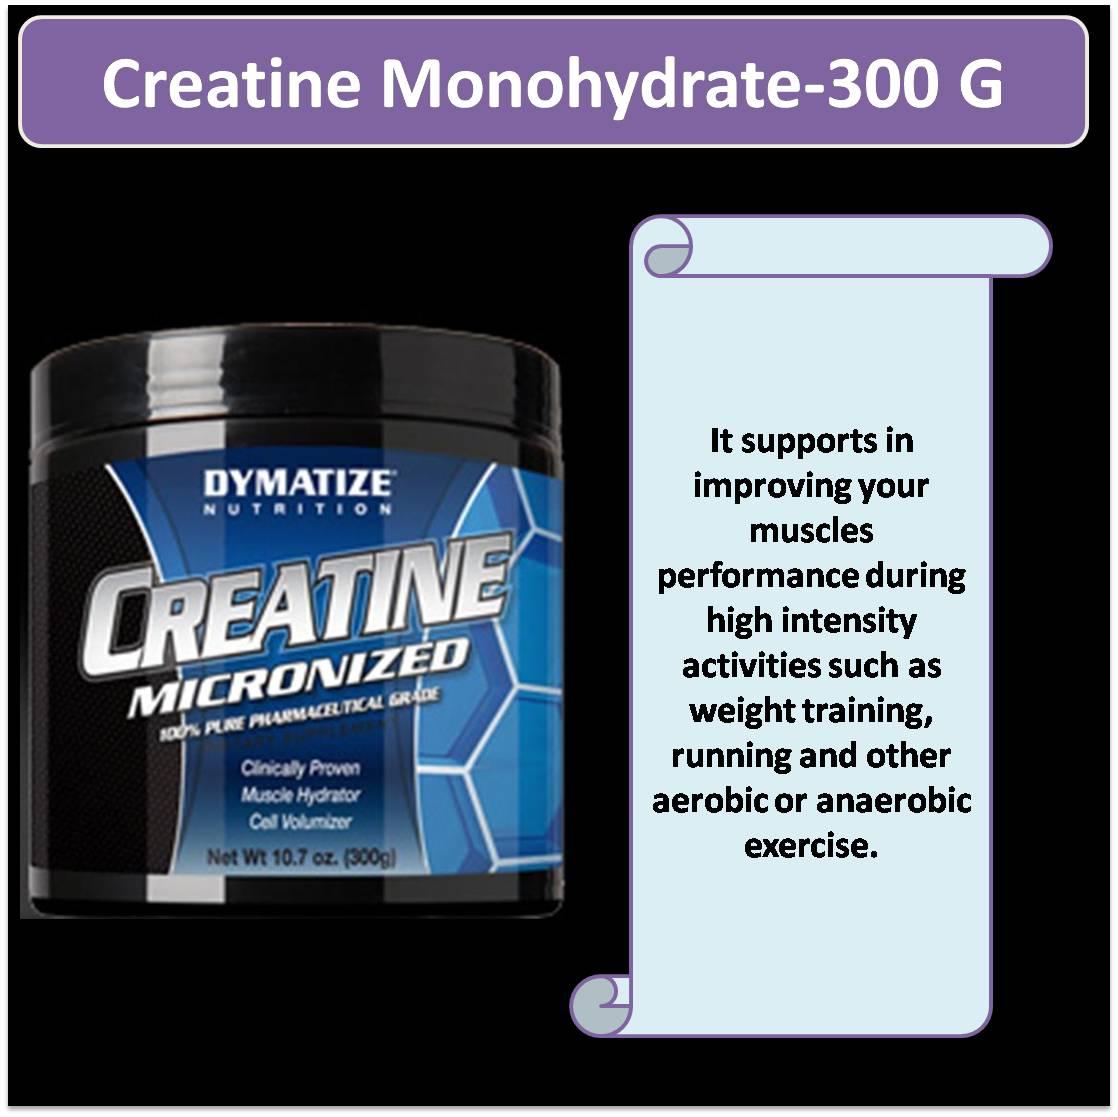 Creatine Monohydrate-300 G